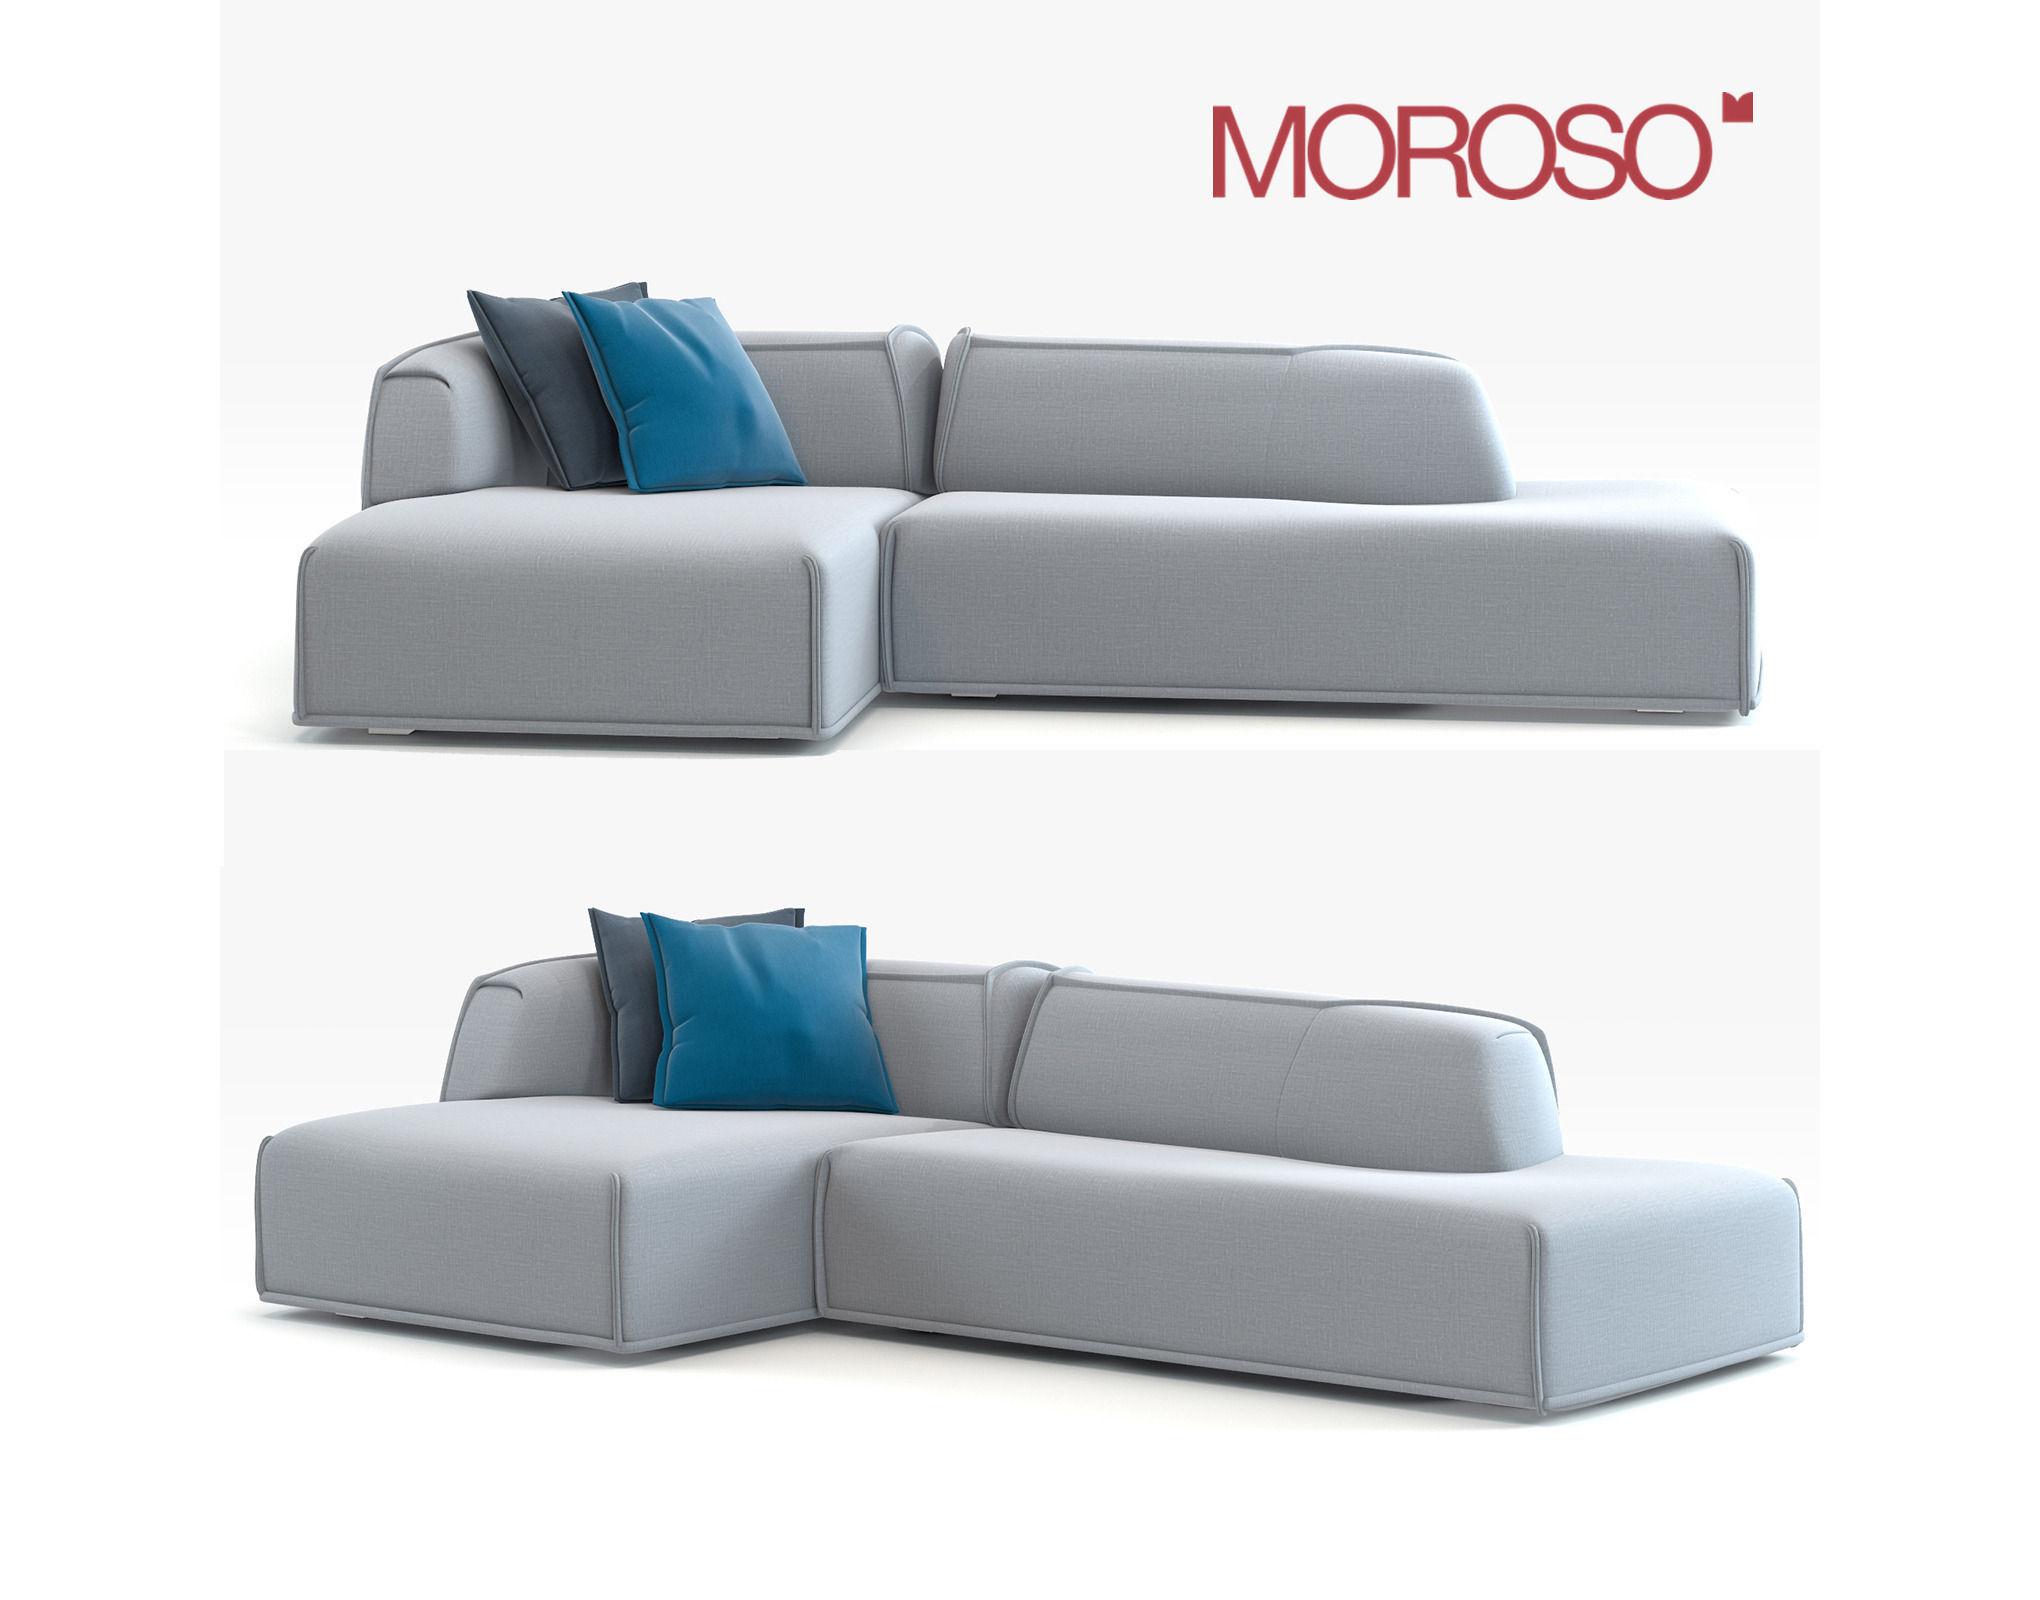 Modern Couch Moroso Mas Model Max Obj Mtl Fbx 1